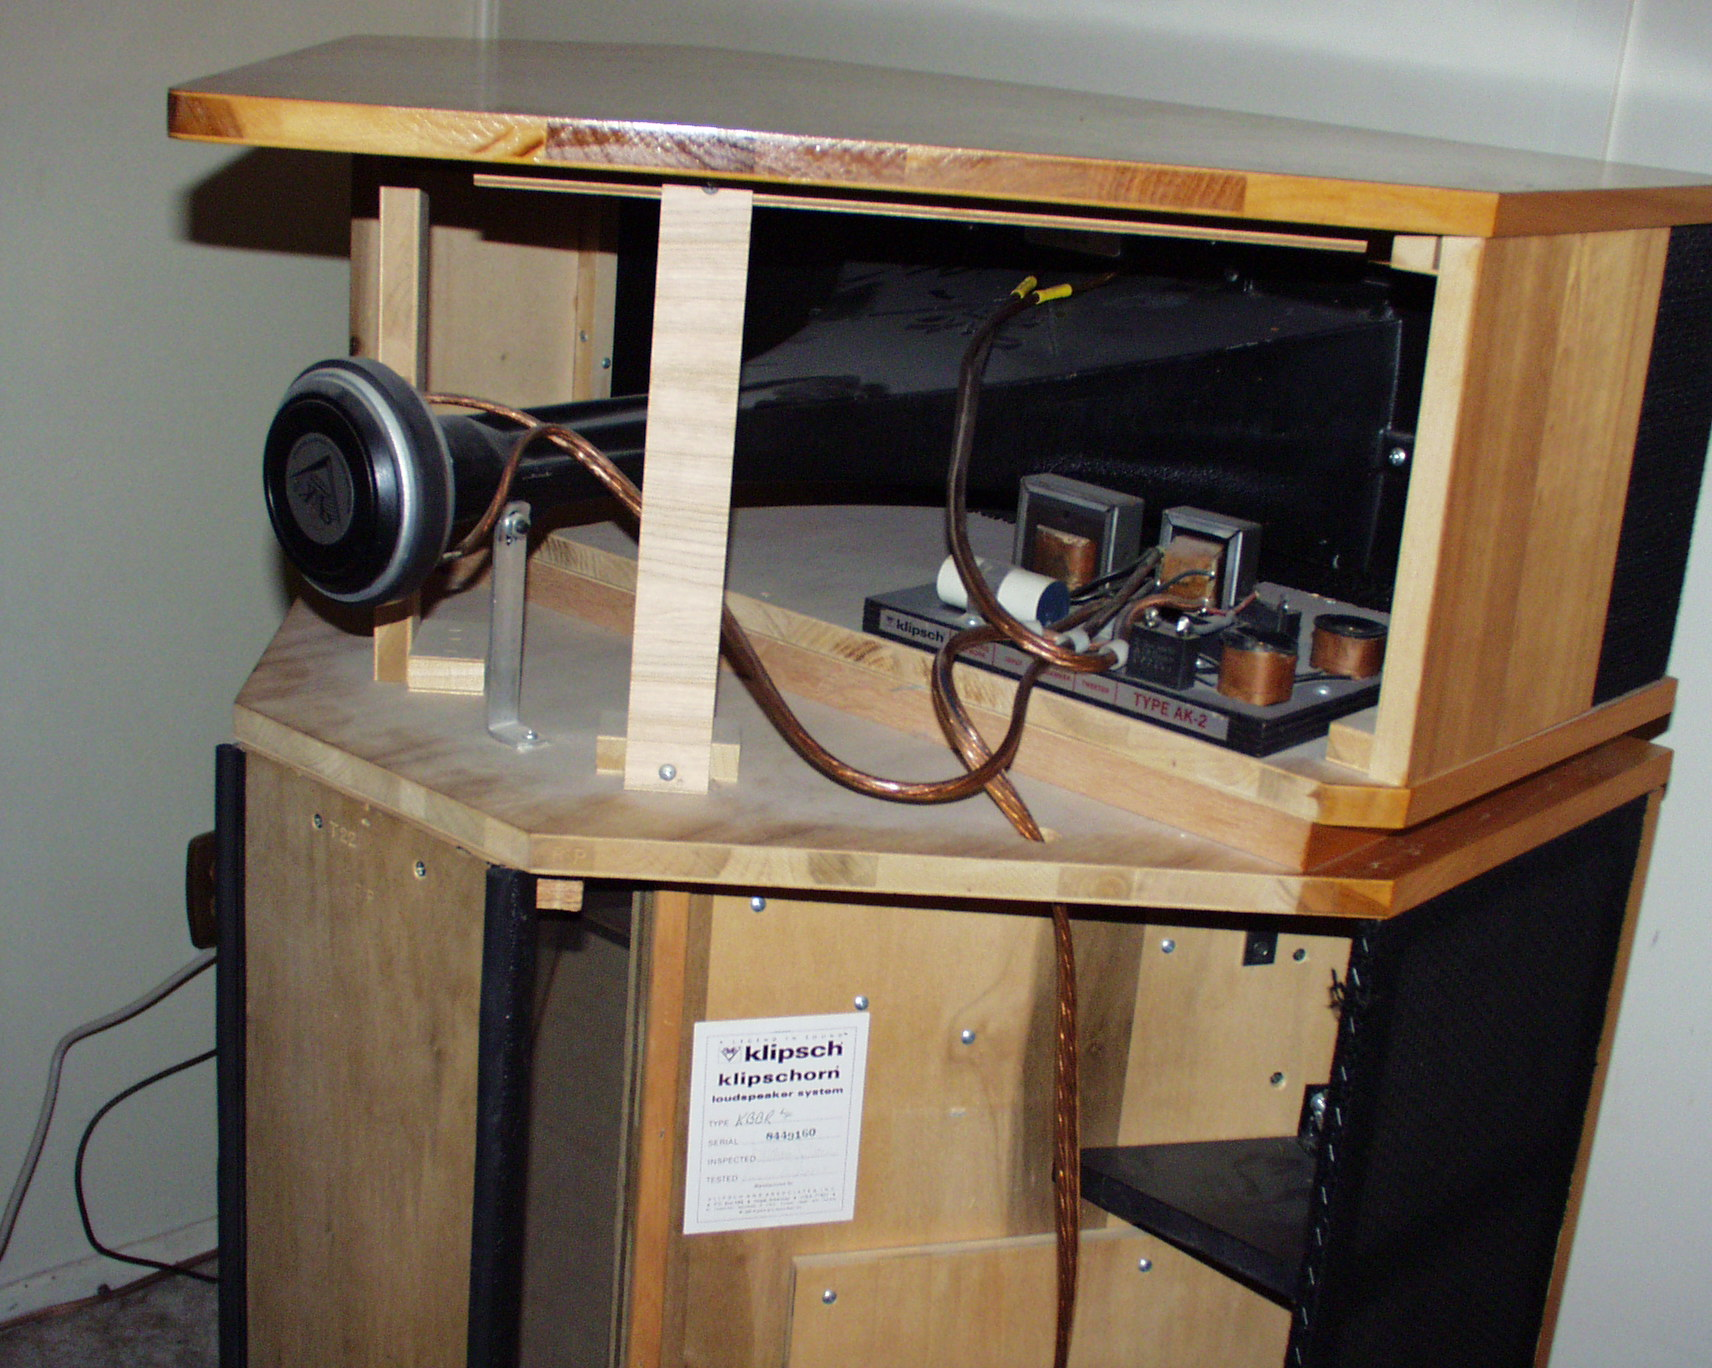 Klipschorn Dynamat Mortite Trunk Seal Happy Me   - Technical  Modifications